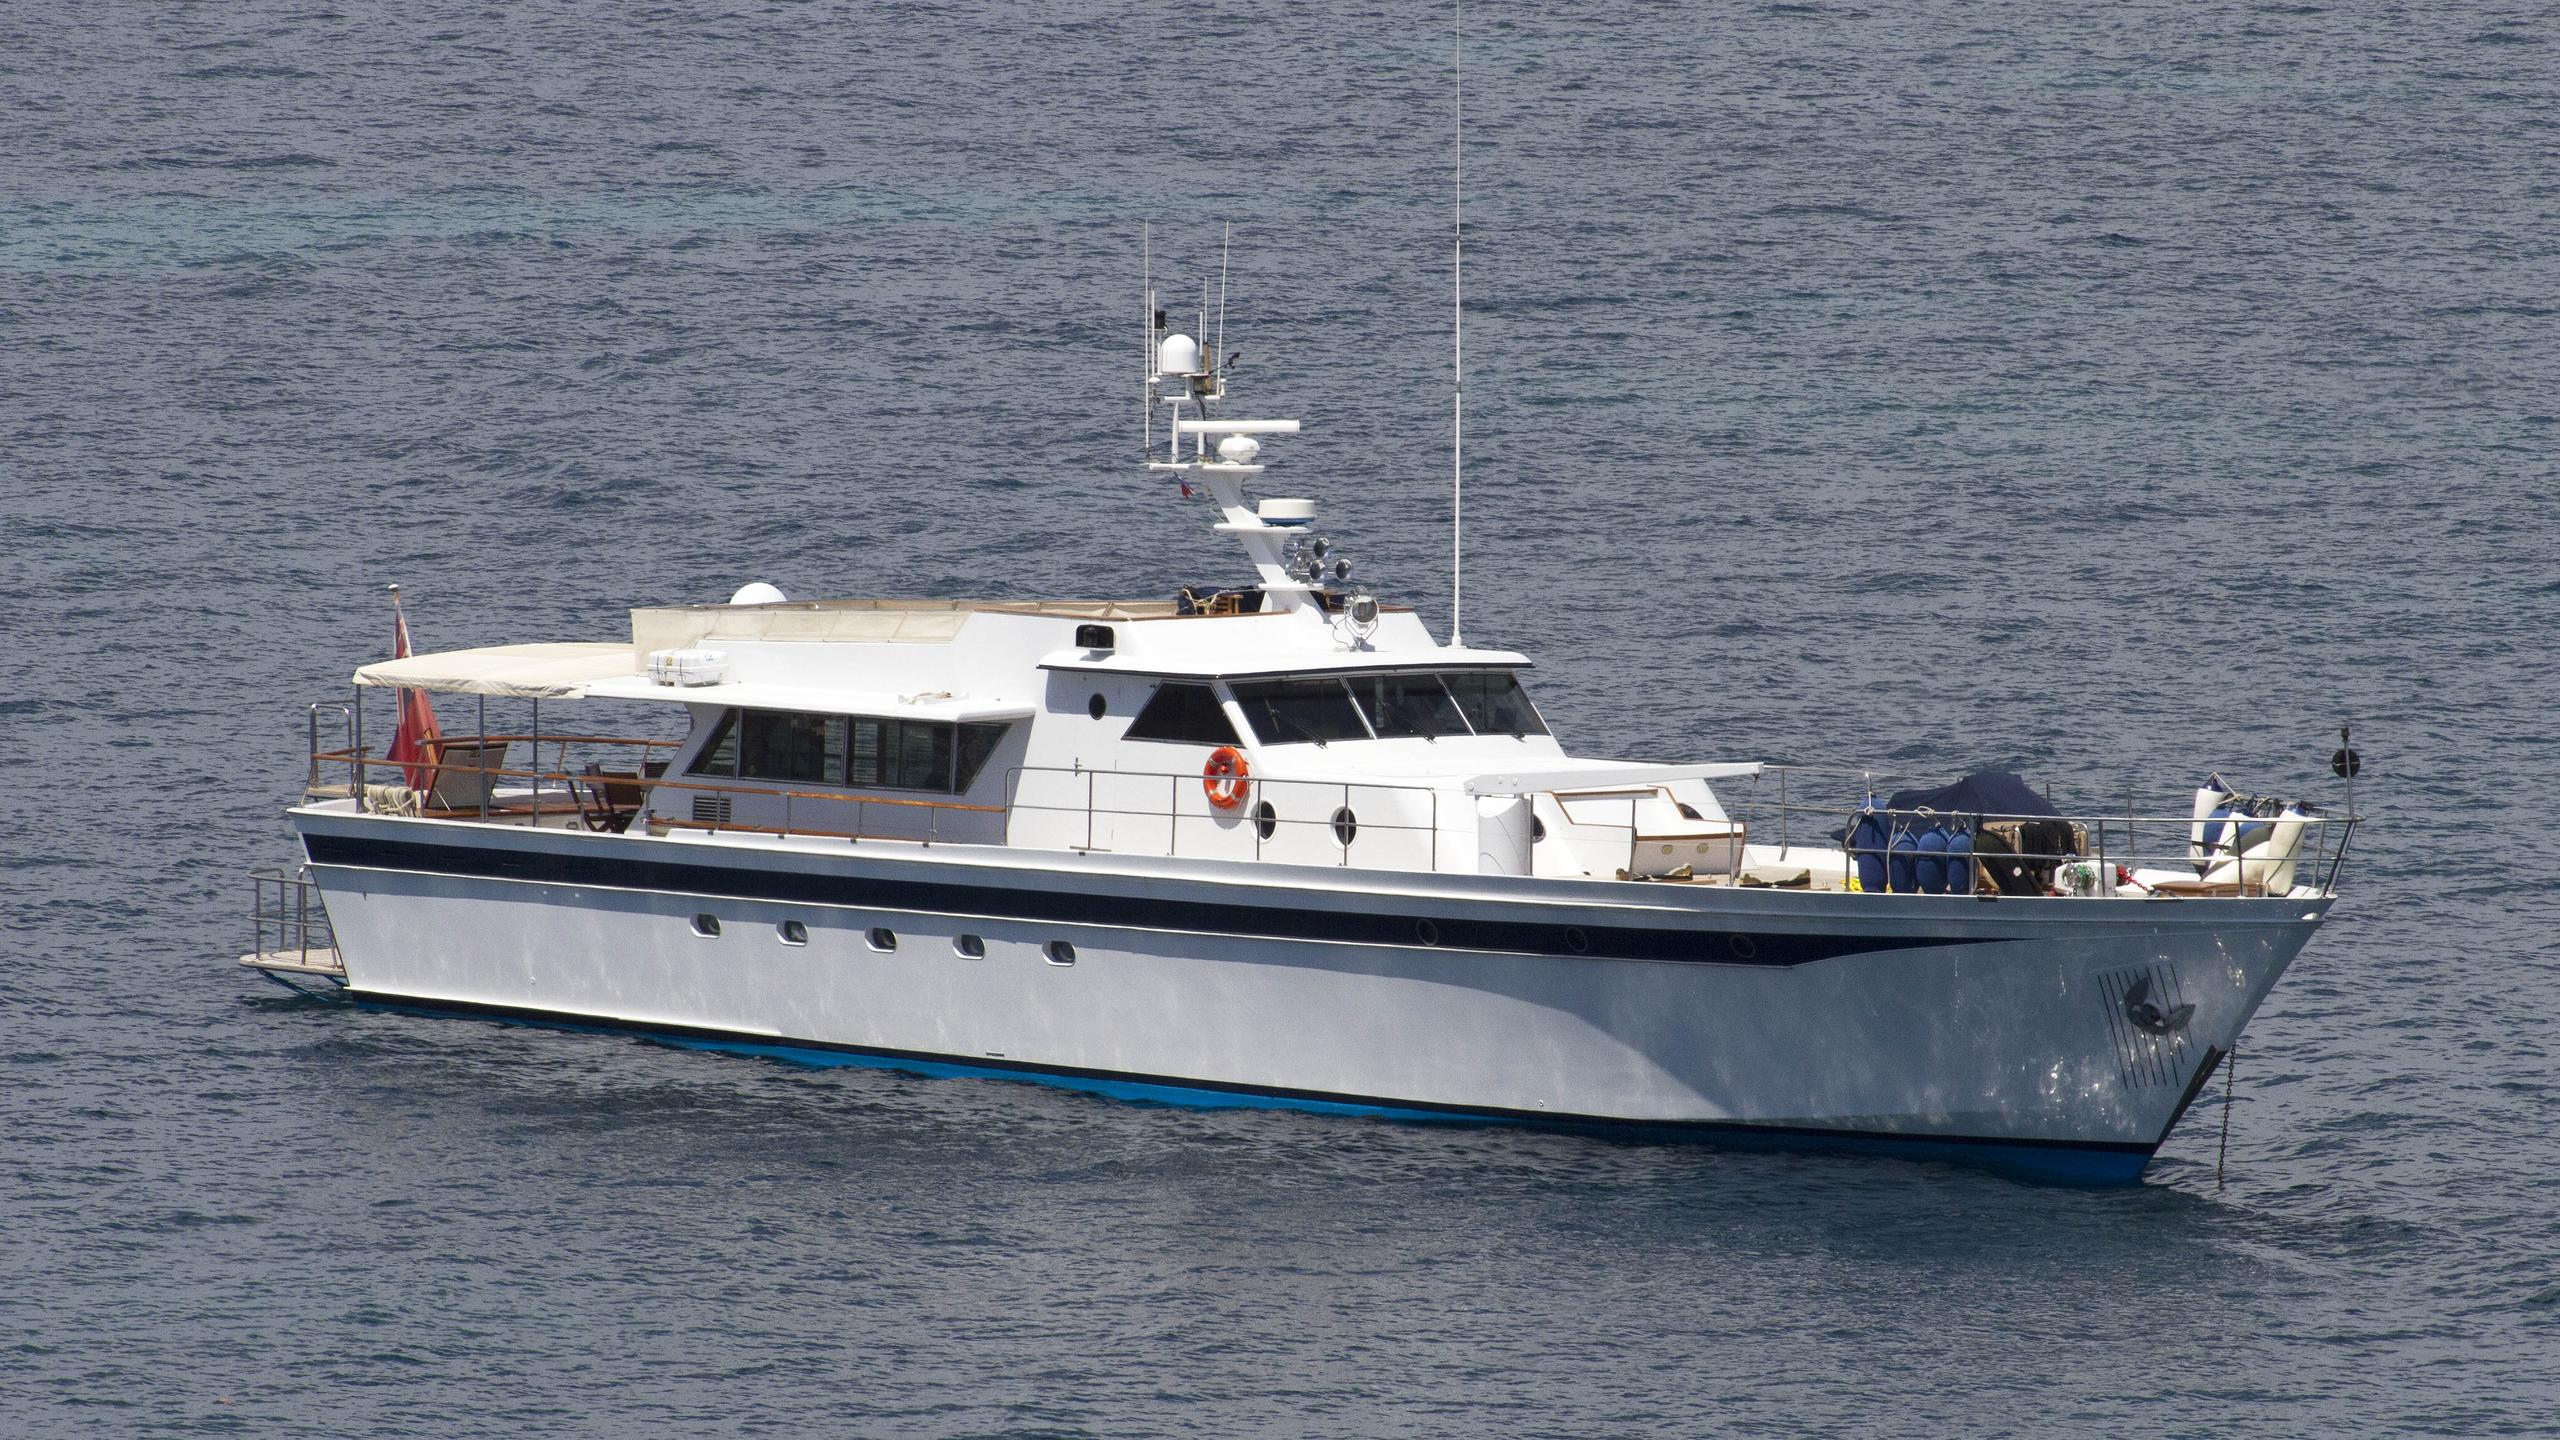 chantella-classic-motor-yacht-cna-aiglon-1966-30m-half-profile